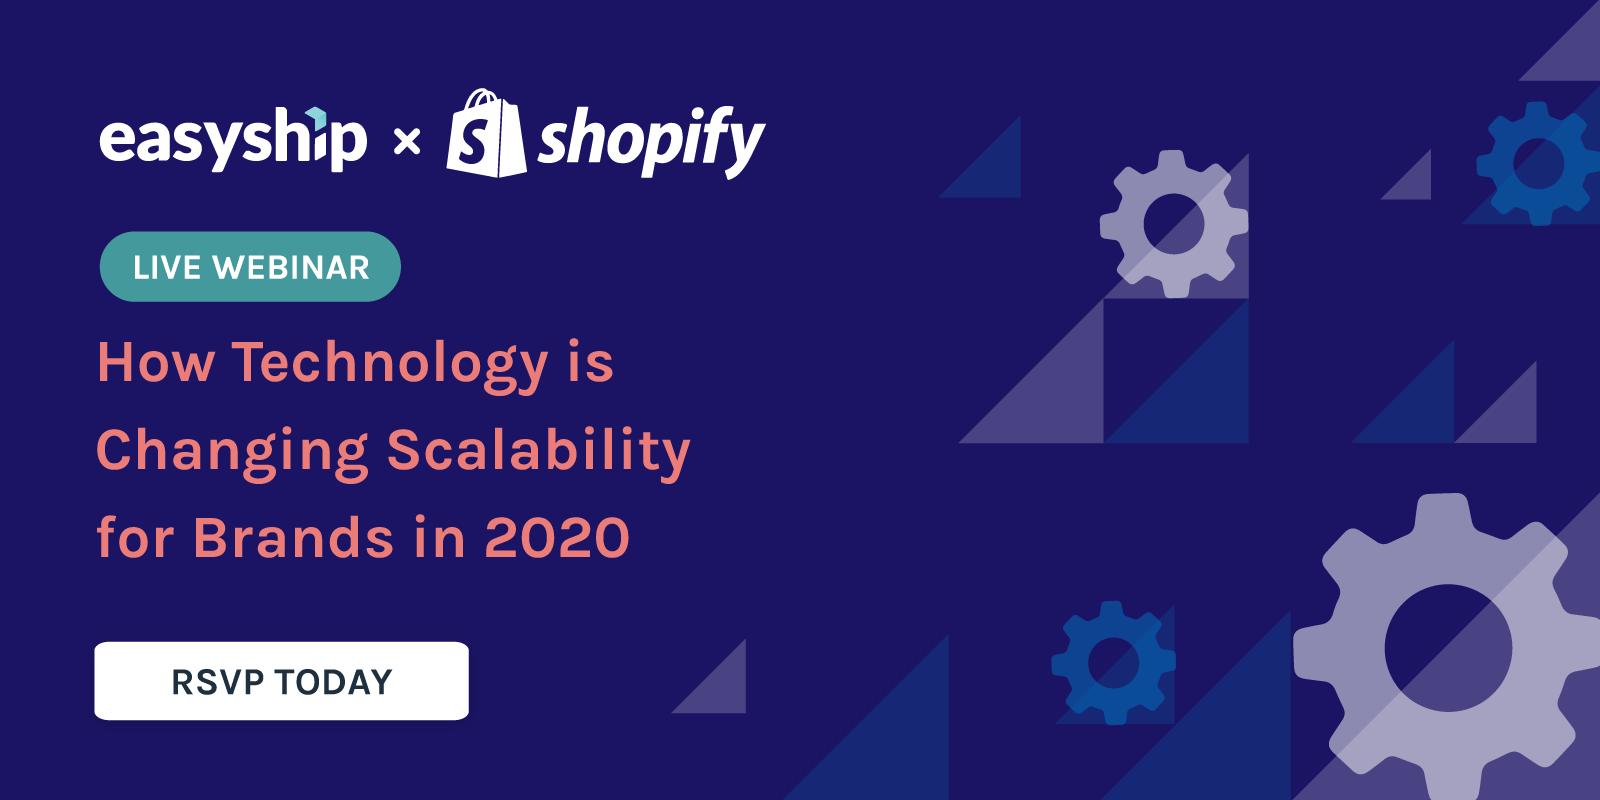 easyship-shopify-webinar-promo-edm-2